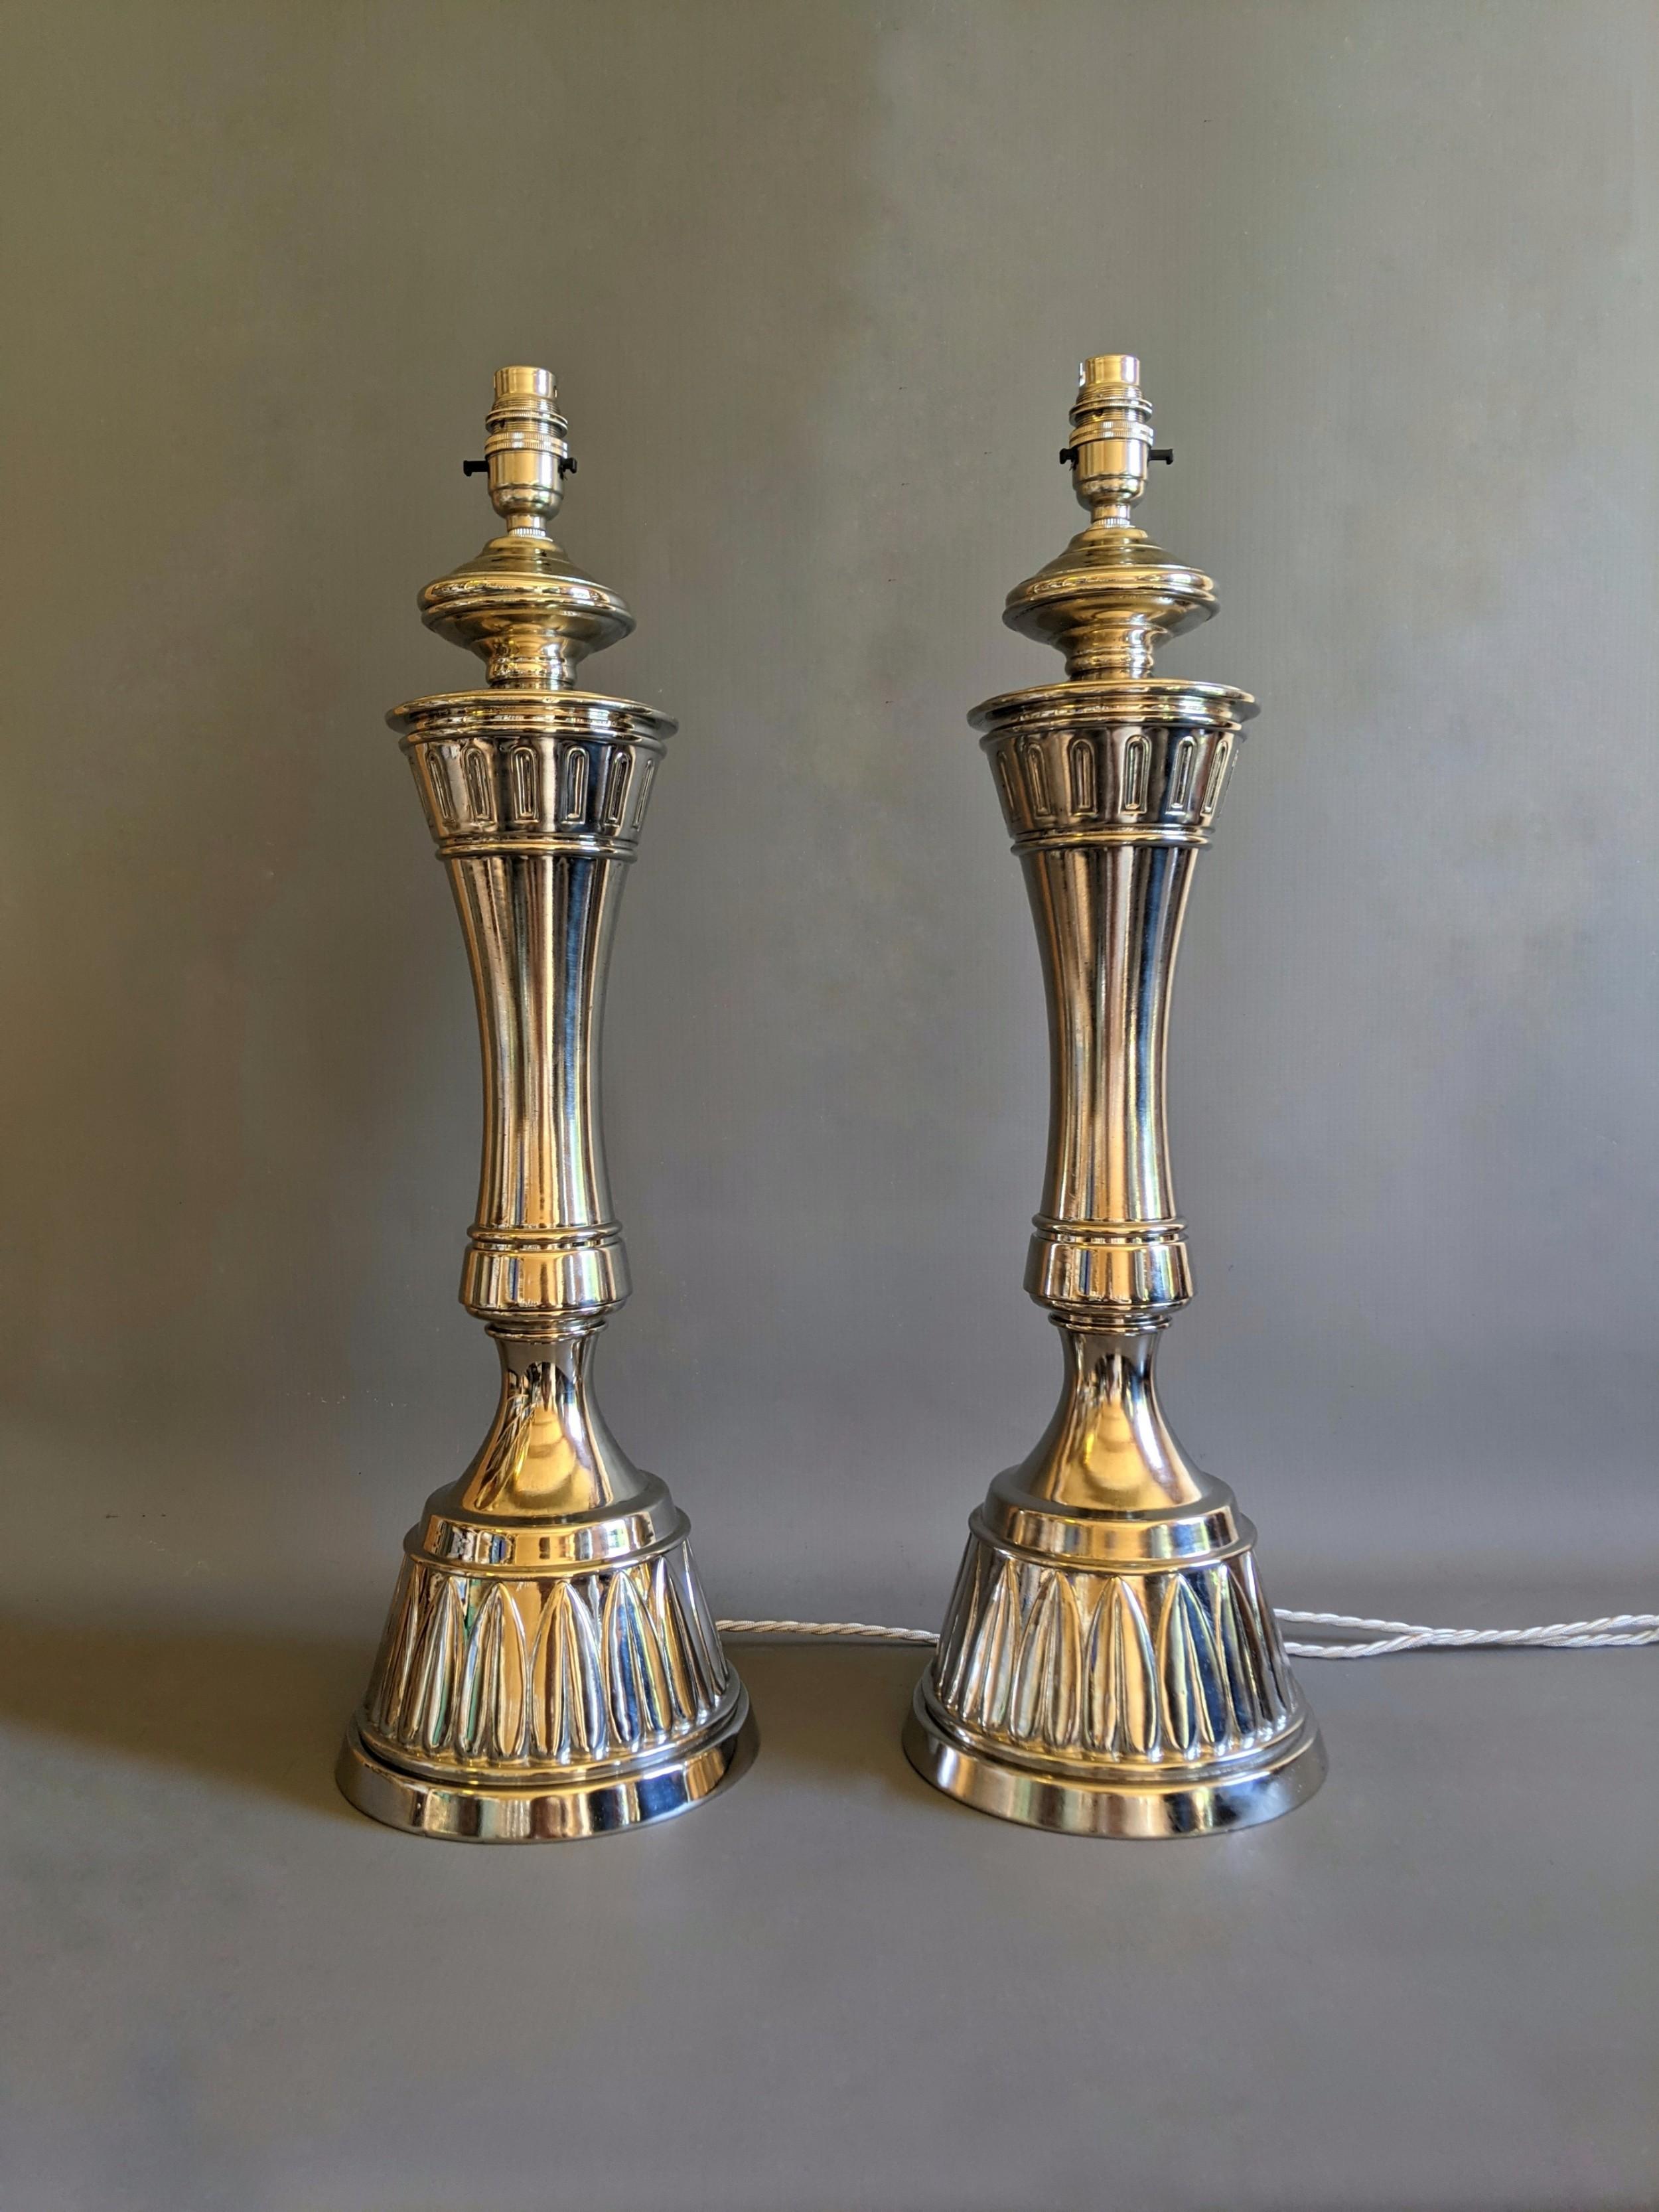 pair of impressive nickel plated lamps